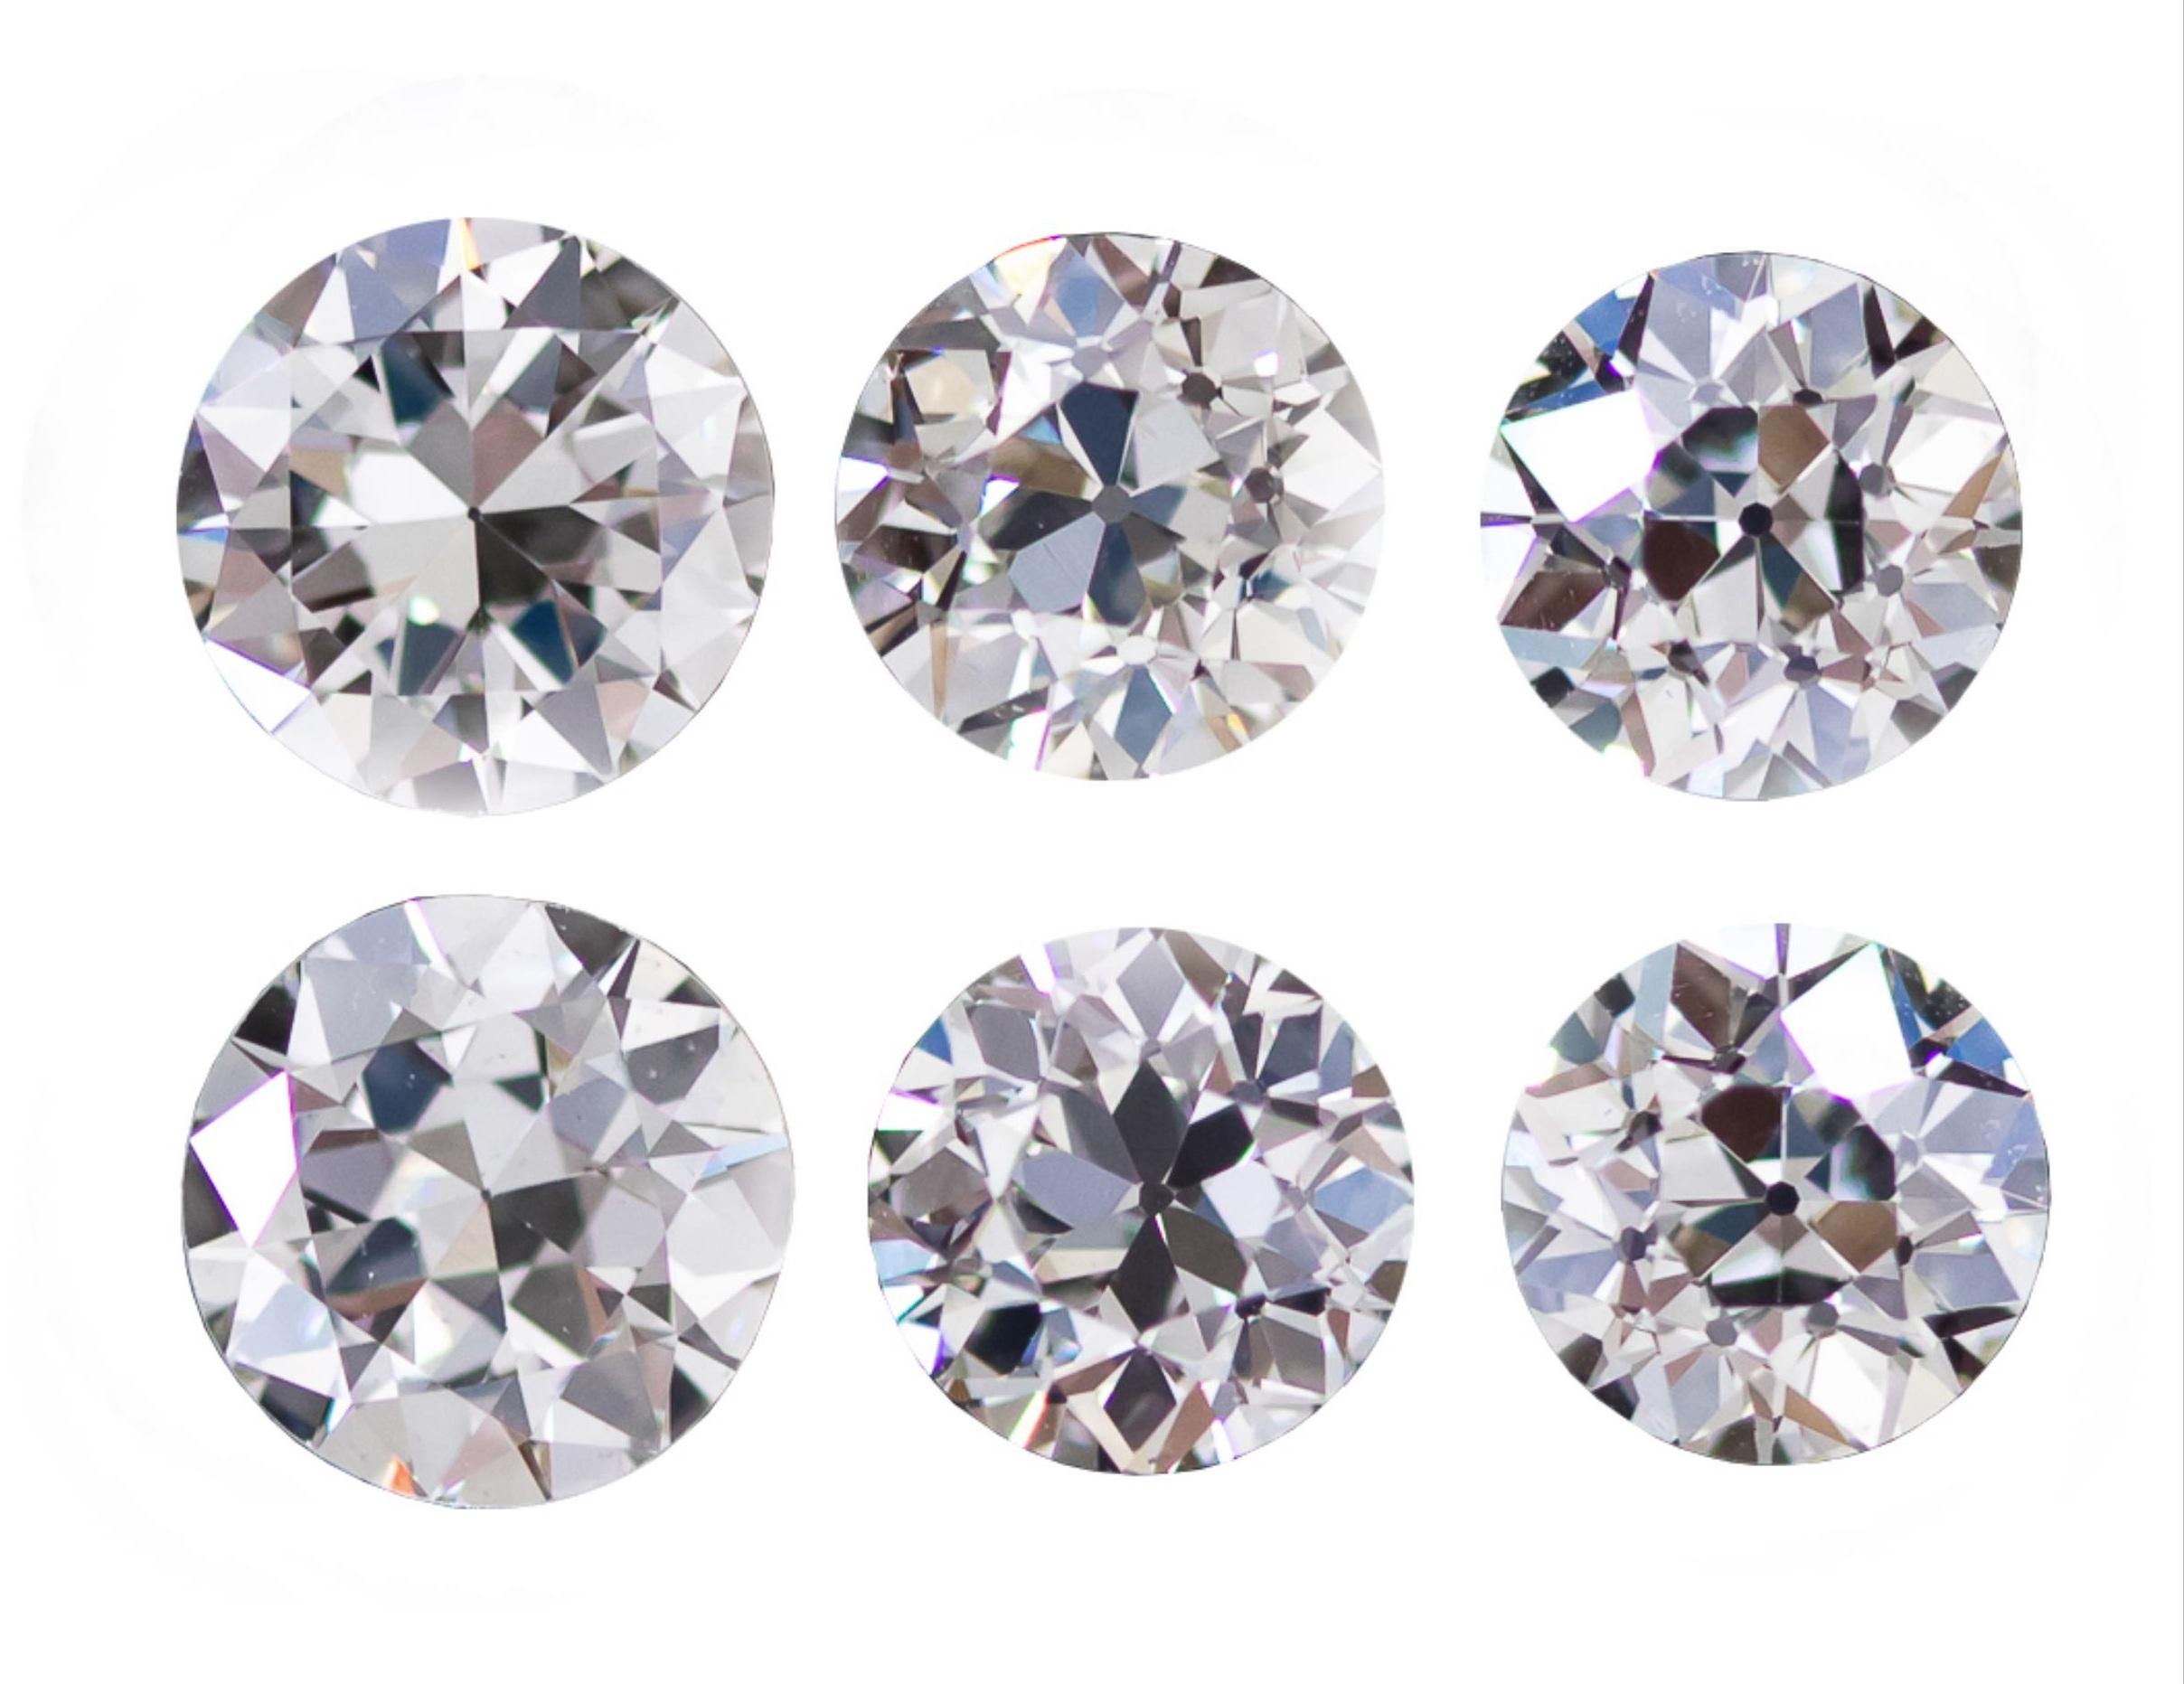 Ethical+Metalsmiths-Diamonds+%281%29.jpg